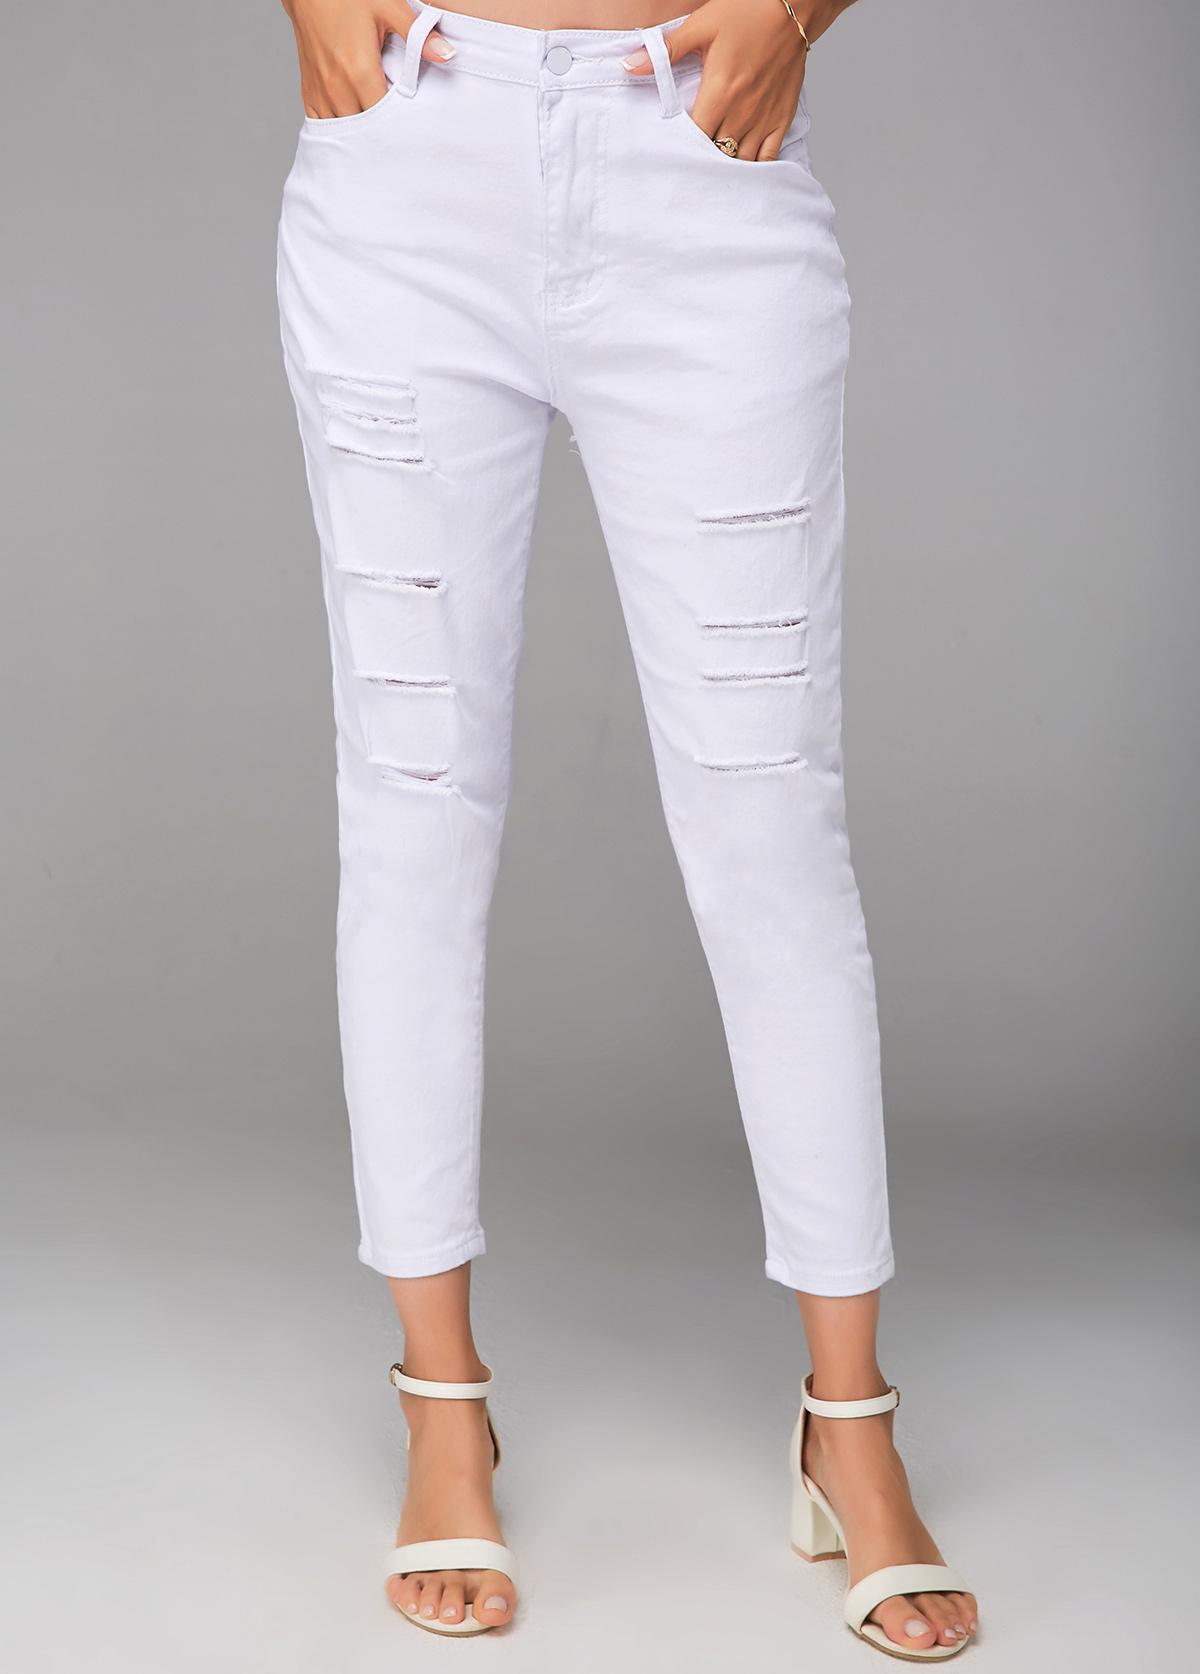 ROTITA White Shredded Cropped Zipper Closure Pants